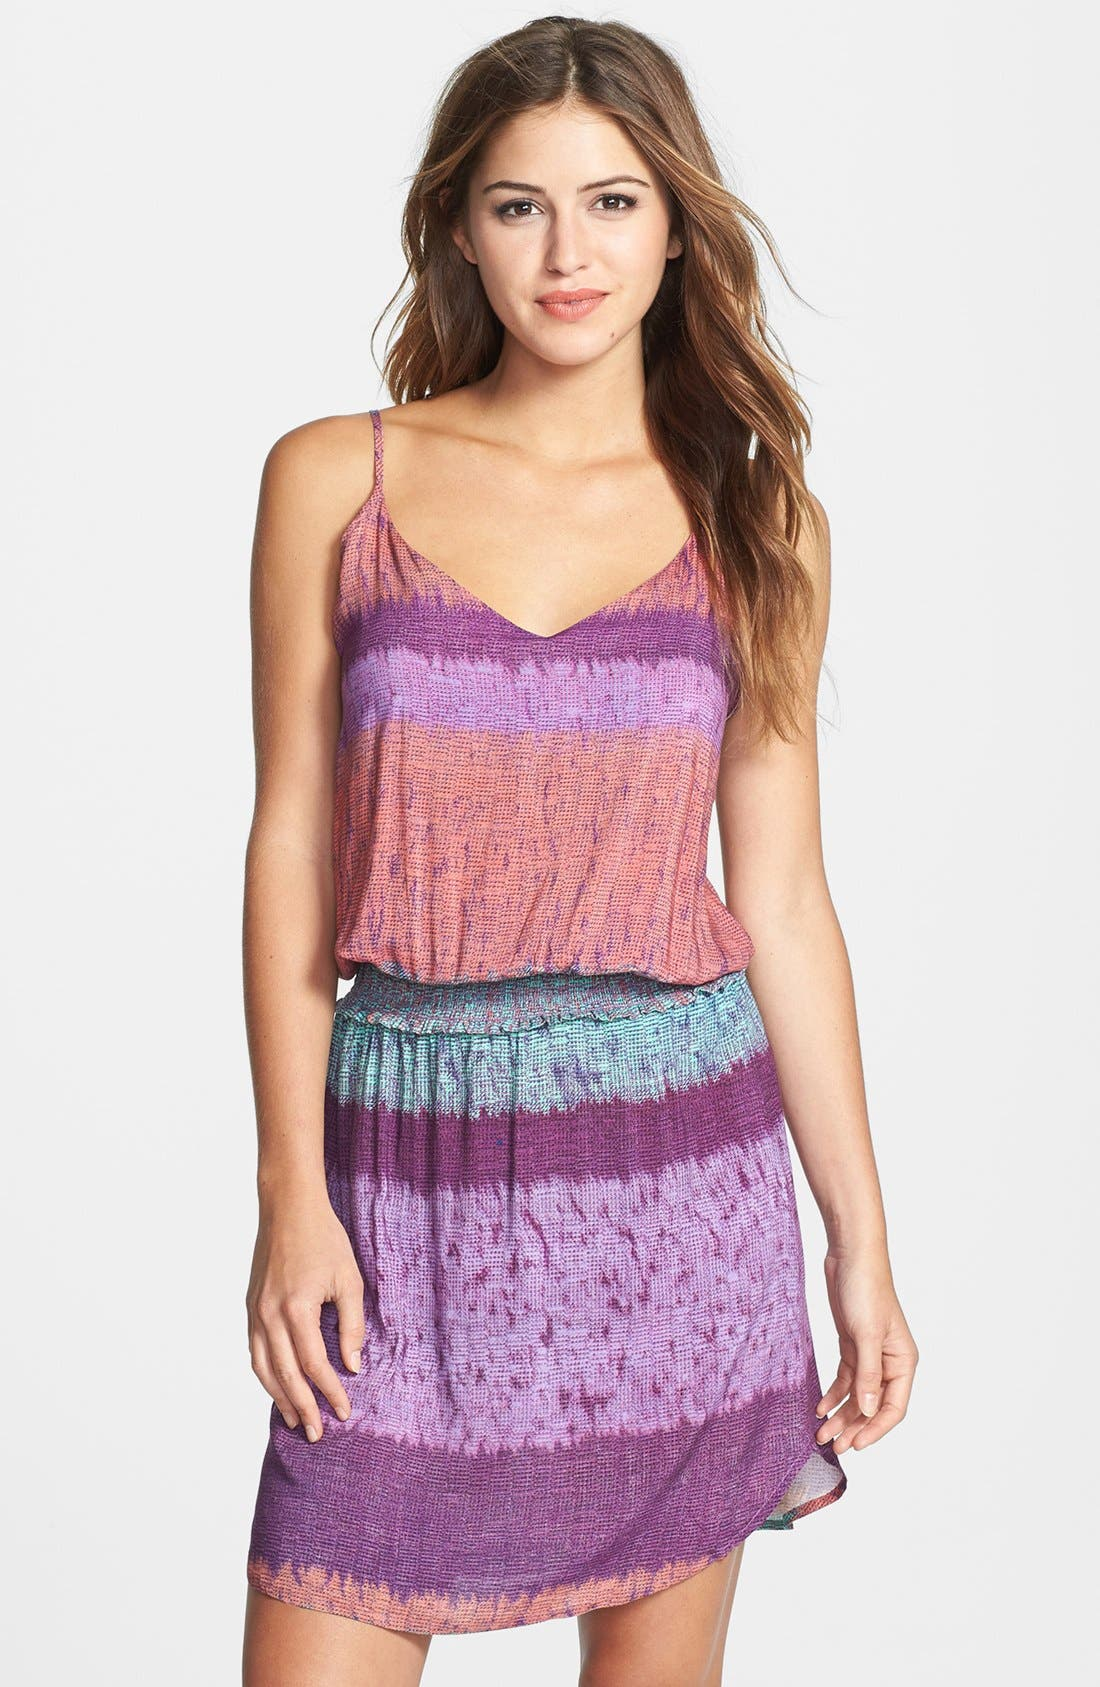 Alternate Image 1 Selected - ViX Swimwear 'Acai Zoe' Cover-Up Dress